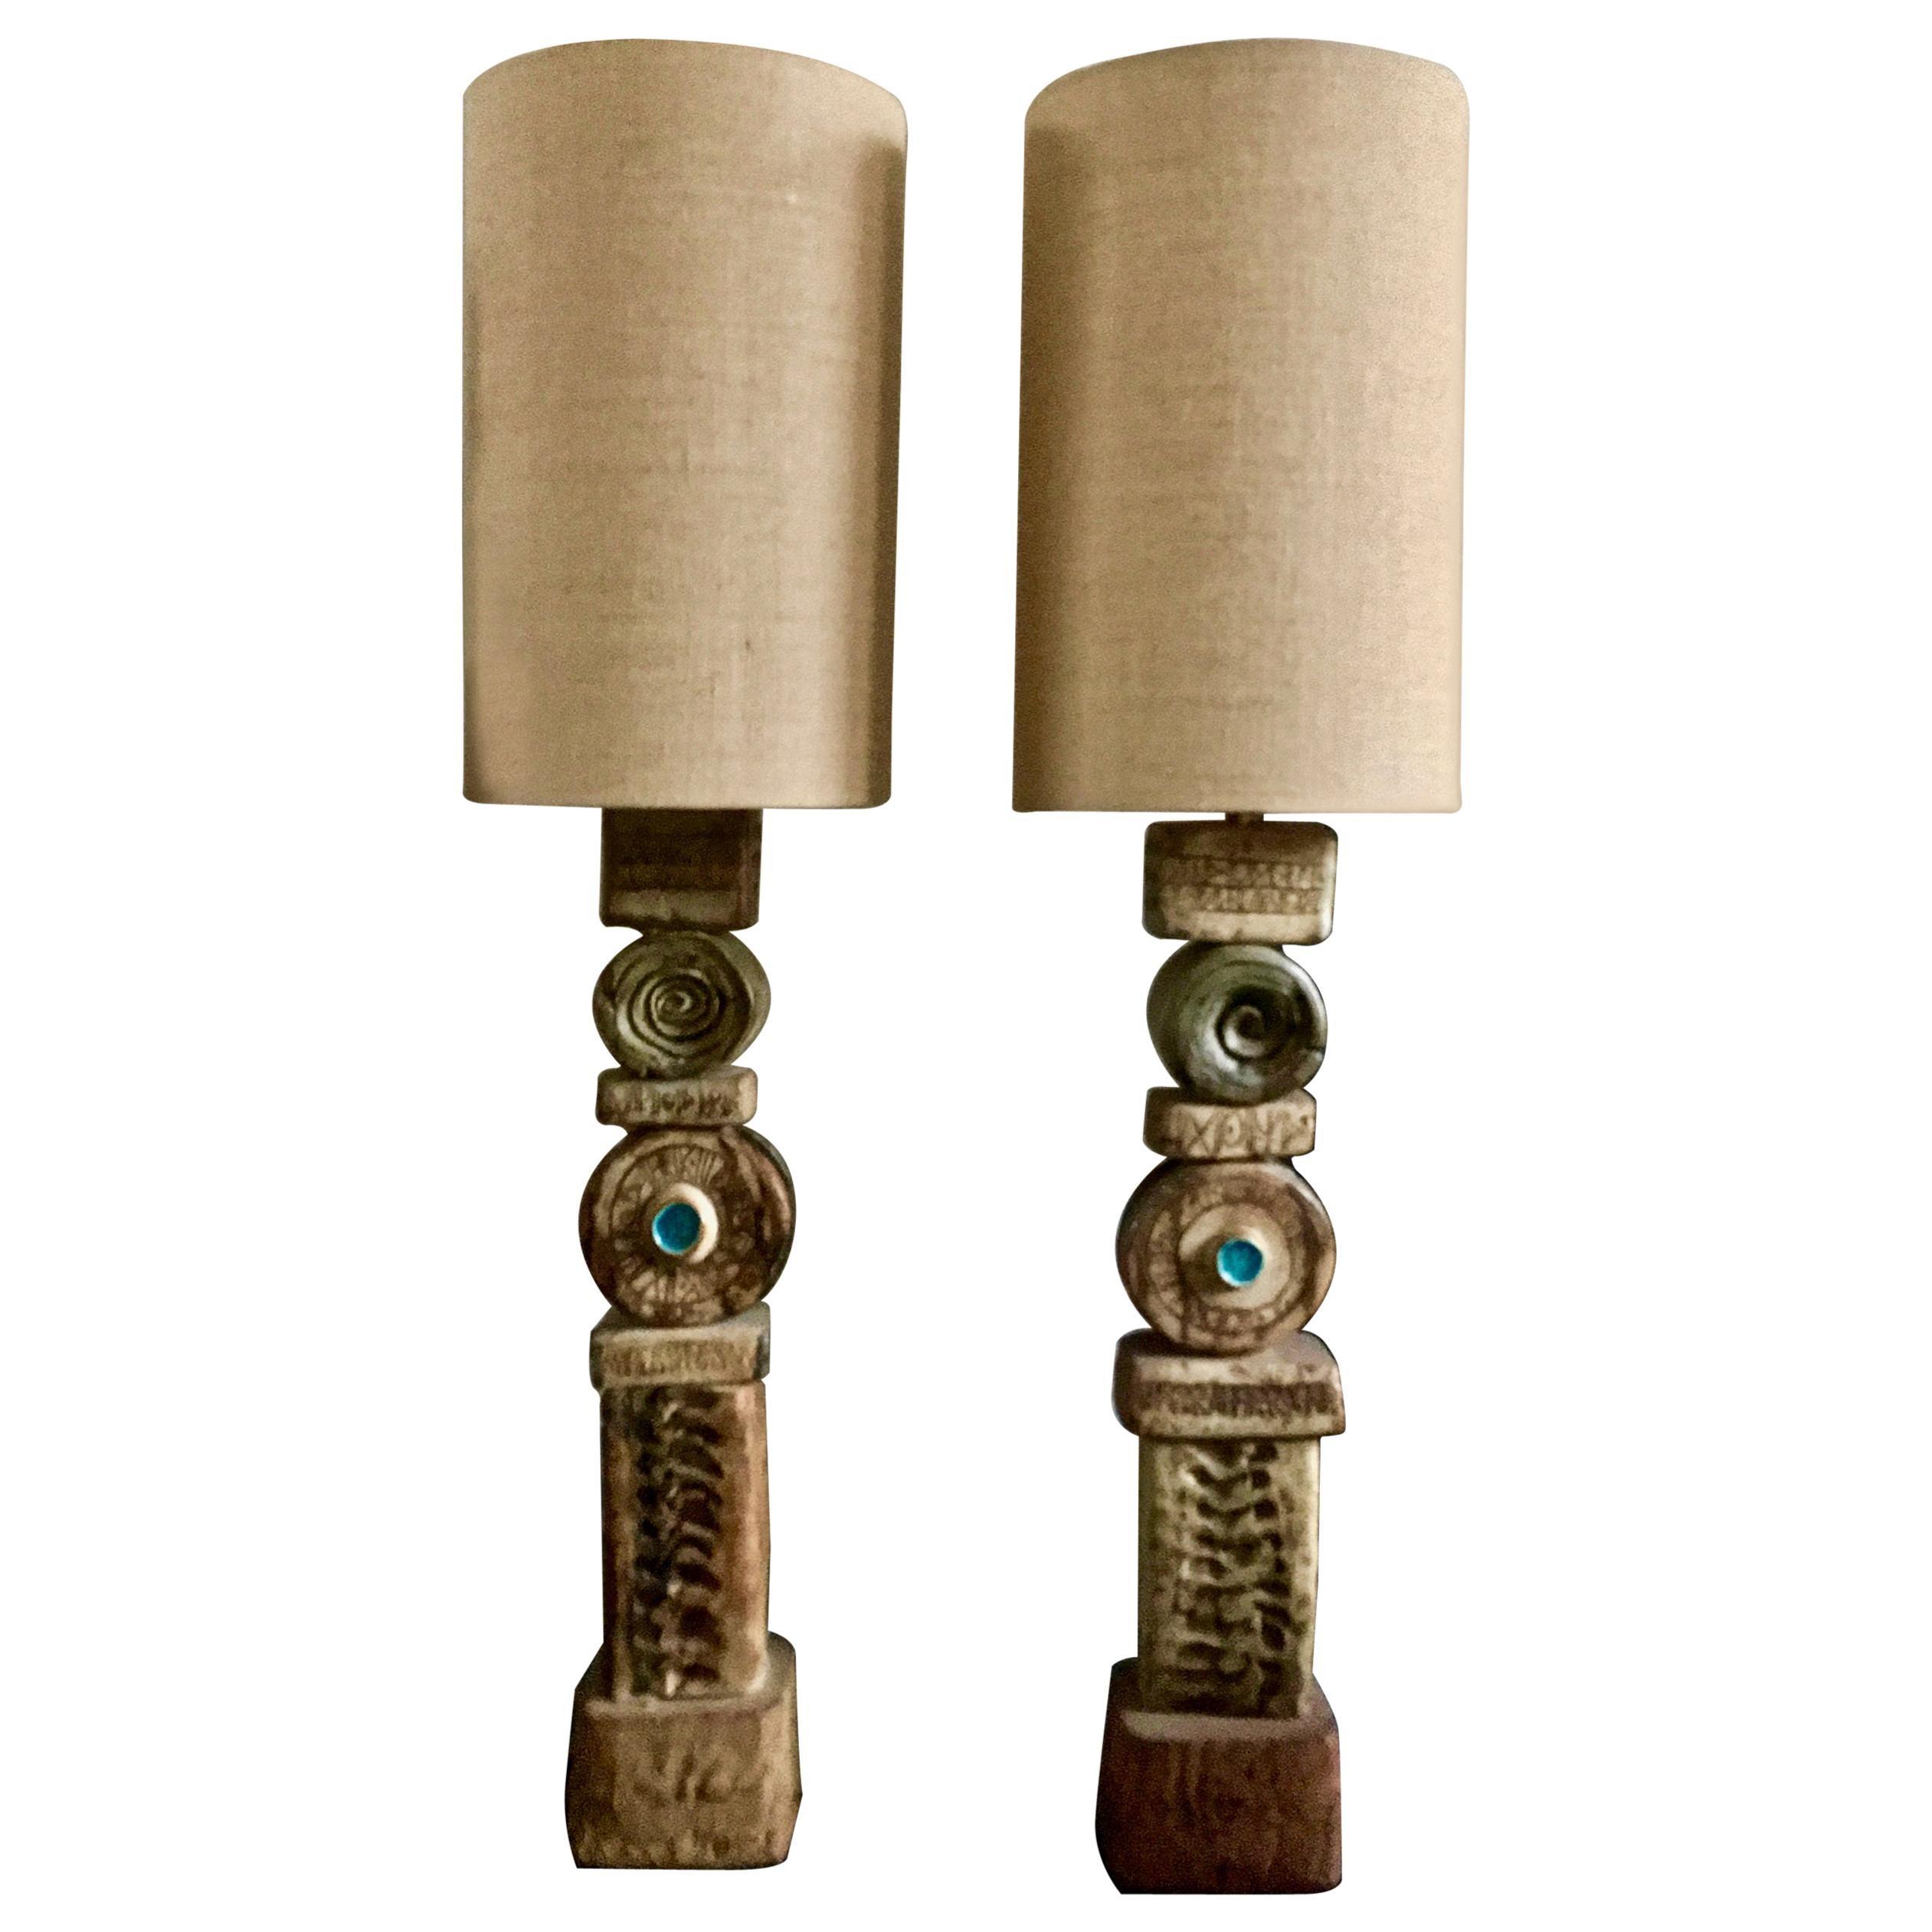 Set of Two Rooke Studio Ceramic TOTEM Lamps Natural Tones, England, 1960s